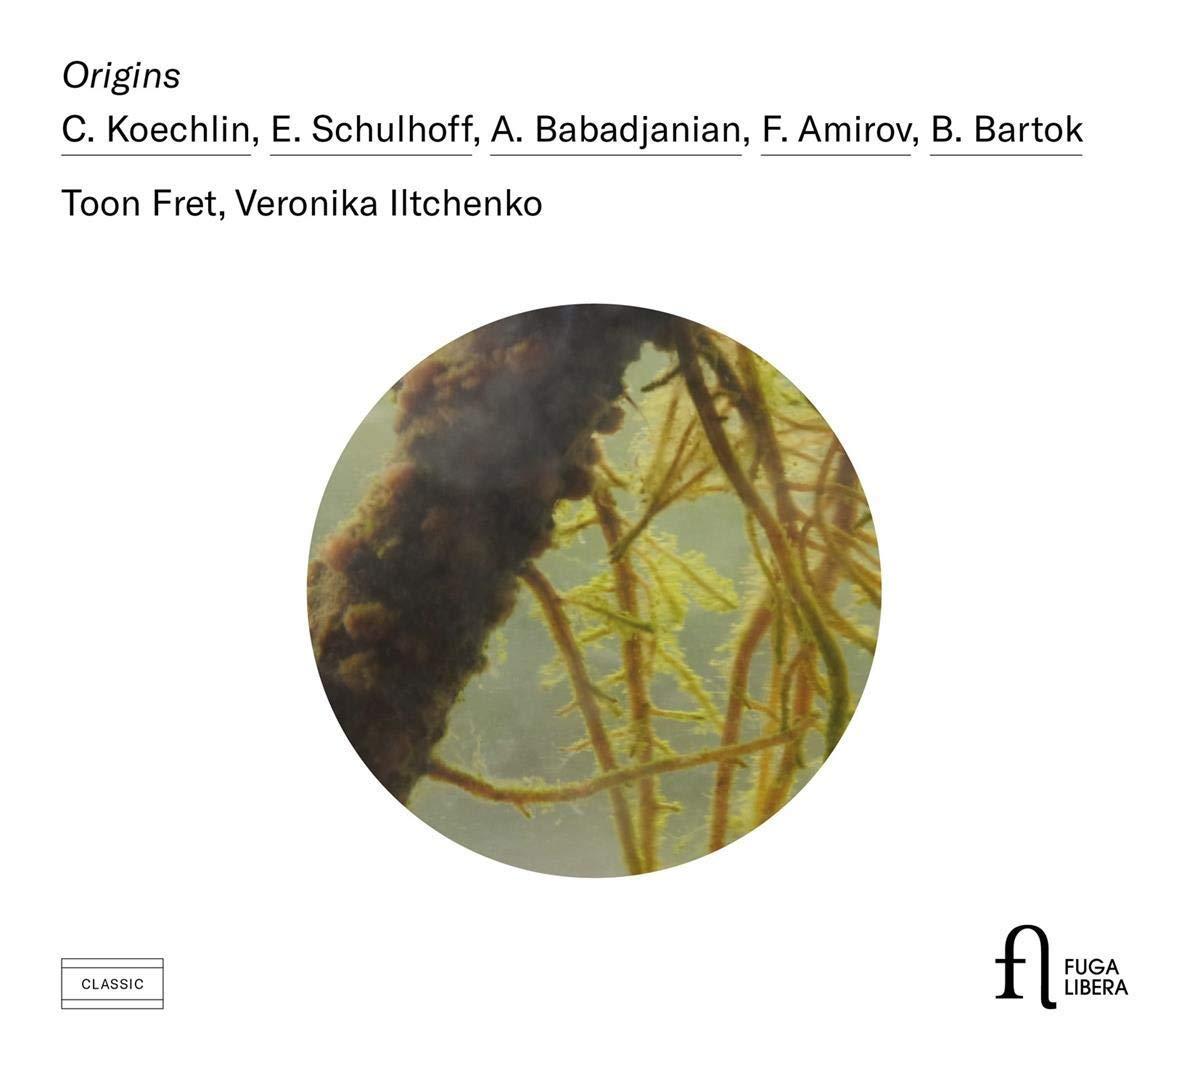 CD : TOON FRET - VERONIKA ILTCHENKO - Origins (CD)